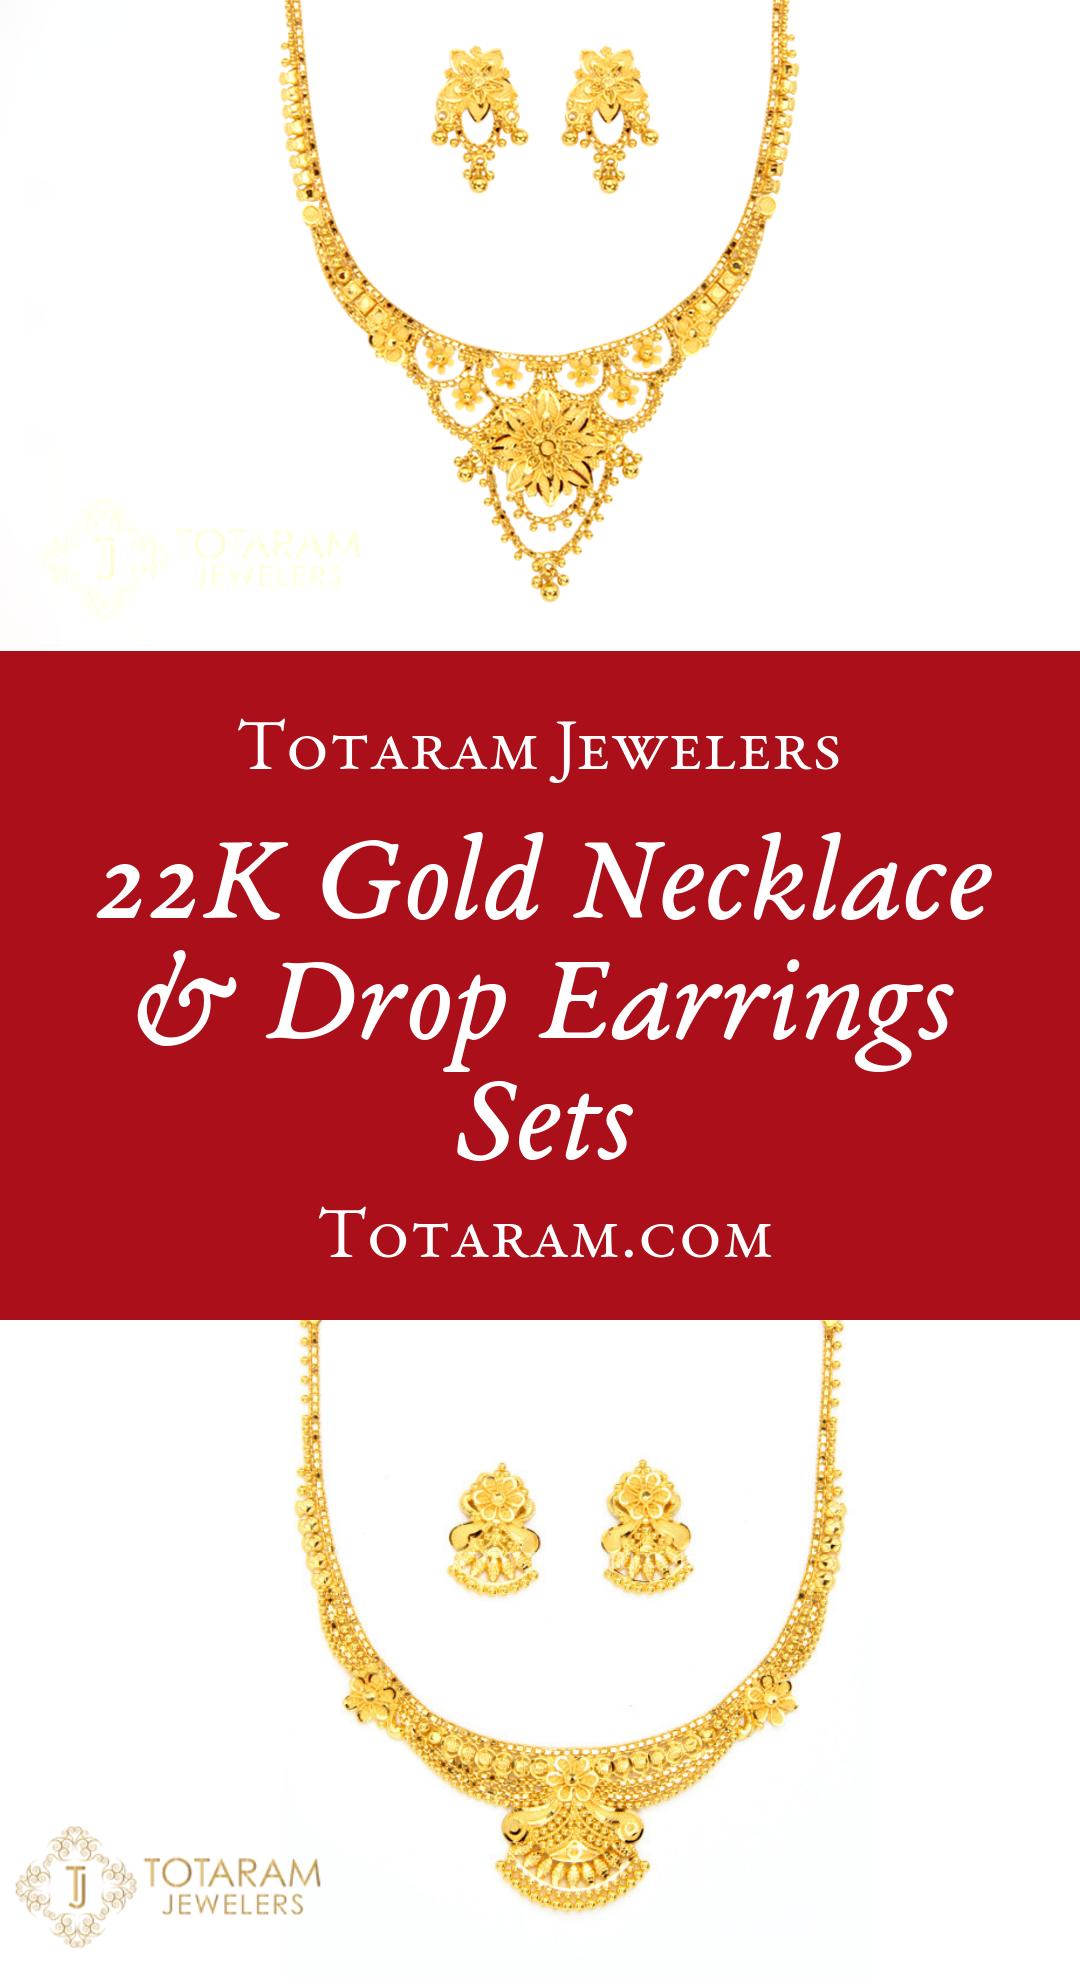 22k Gold Necklace Sets 22k Gold Necklace Gold Necklace Gold Necklace Set